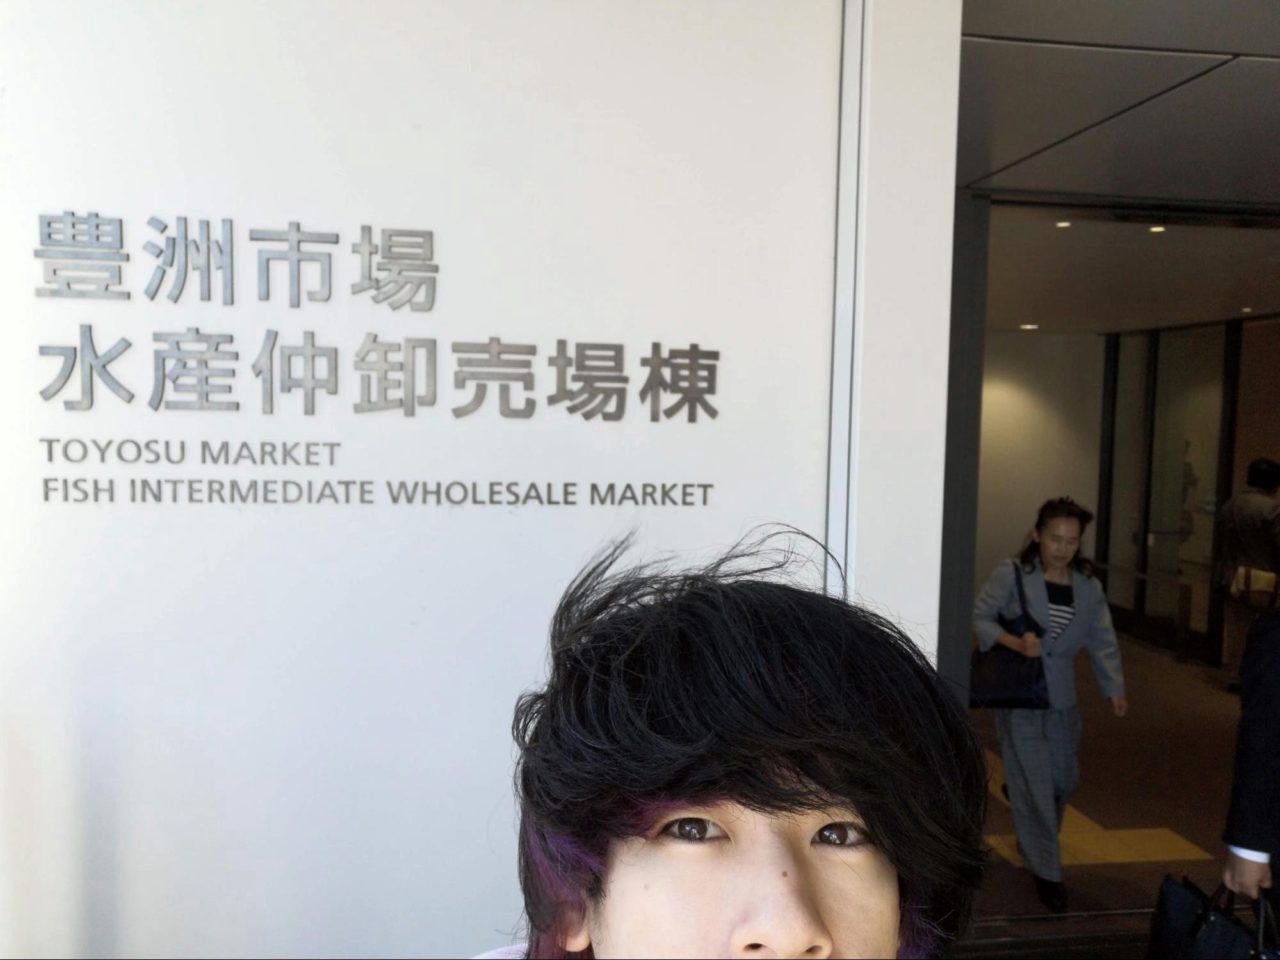 豊洲市場の水産仲卸売場